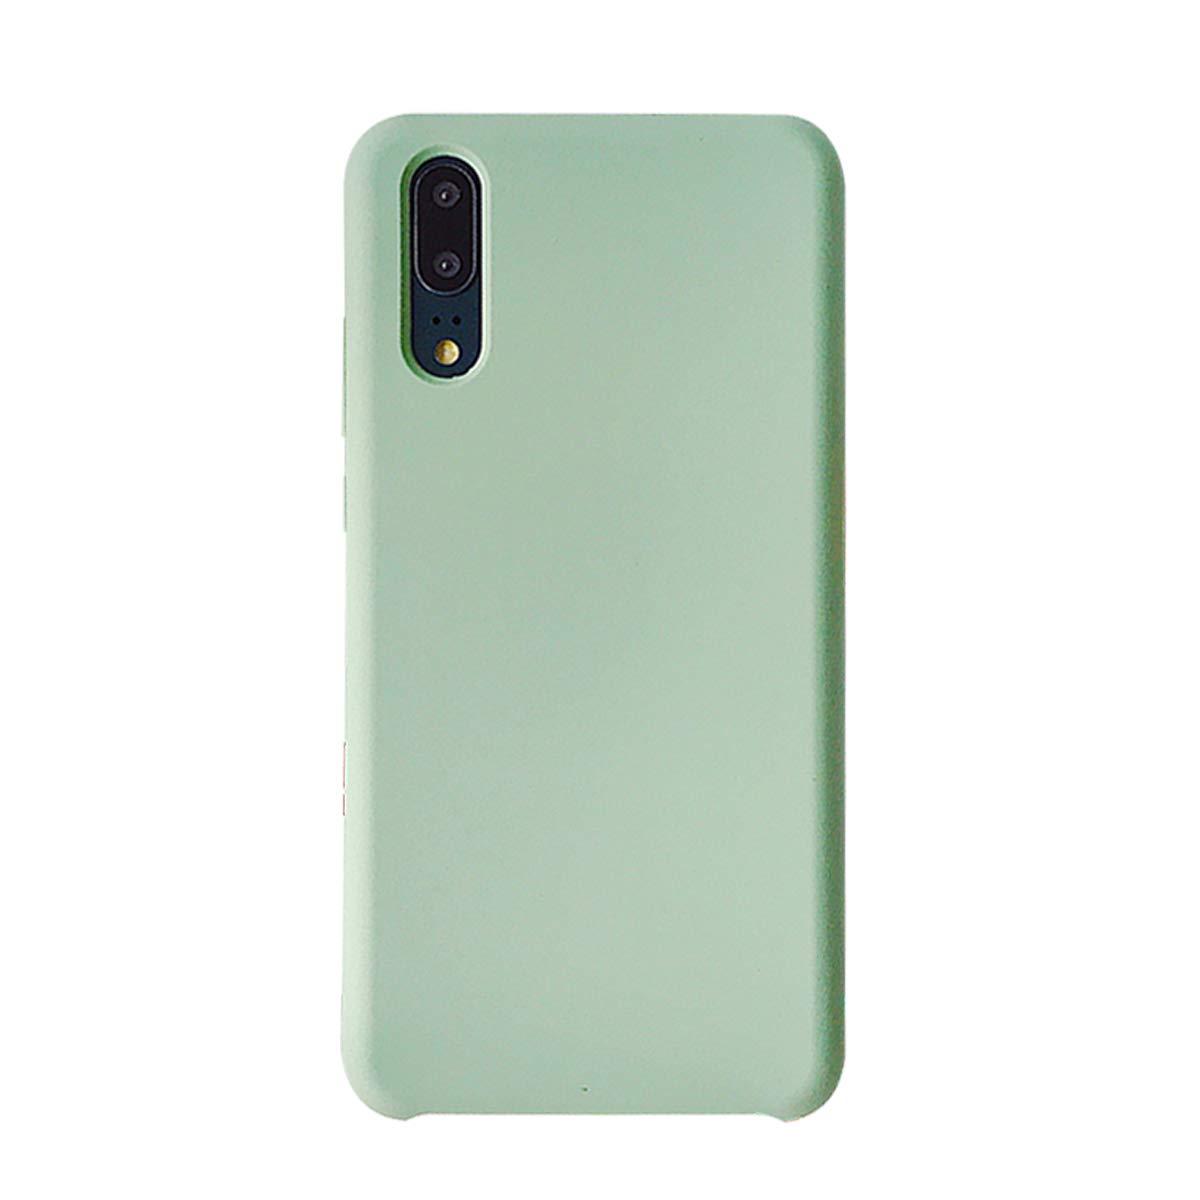 b96e9a2731c Comprar Funda Compatible con Huawei P20 Lite / P20 Pro Carcasa ...